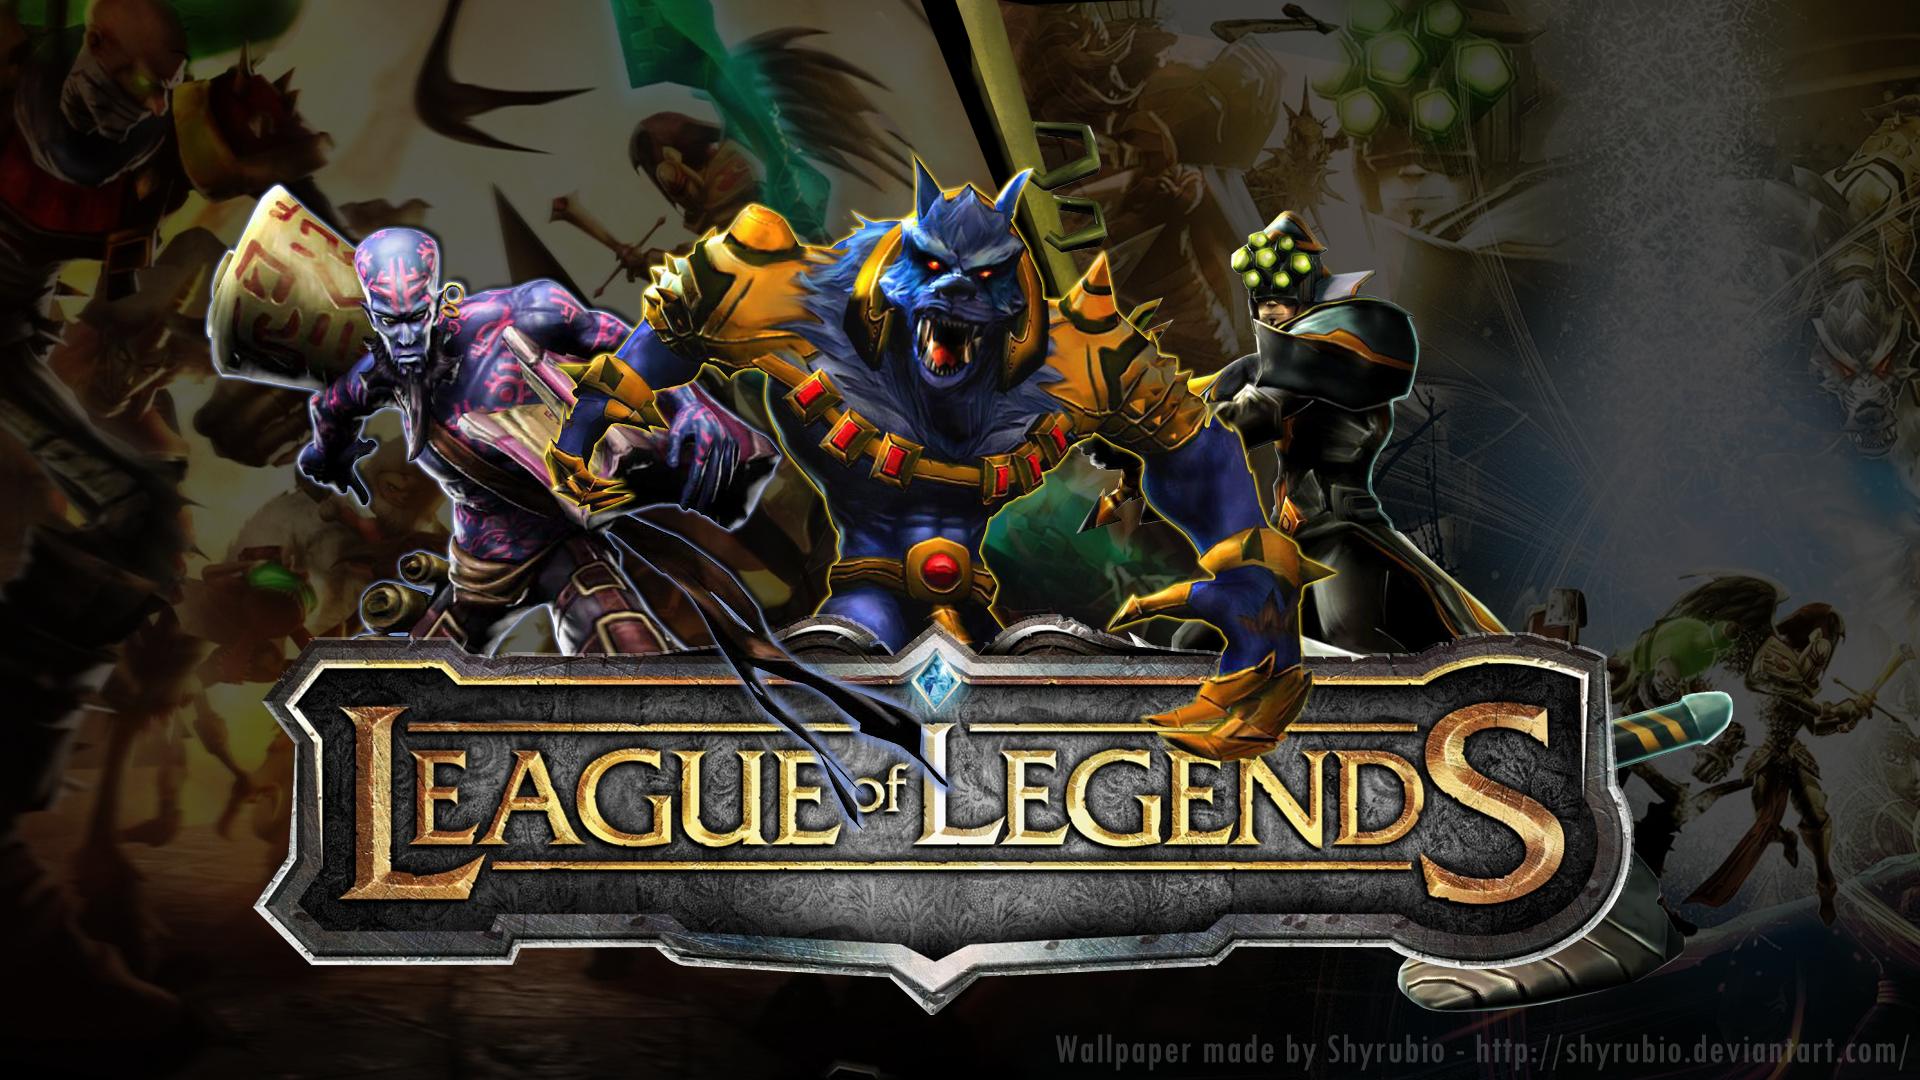 League of Legends. League_Of_Legends___Wallpaper_by_shyrubio